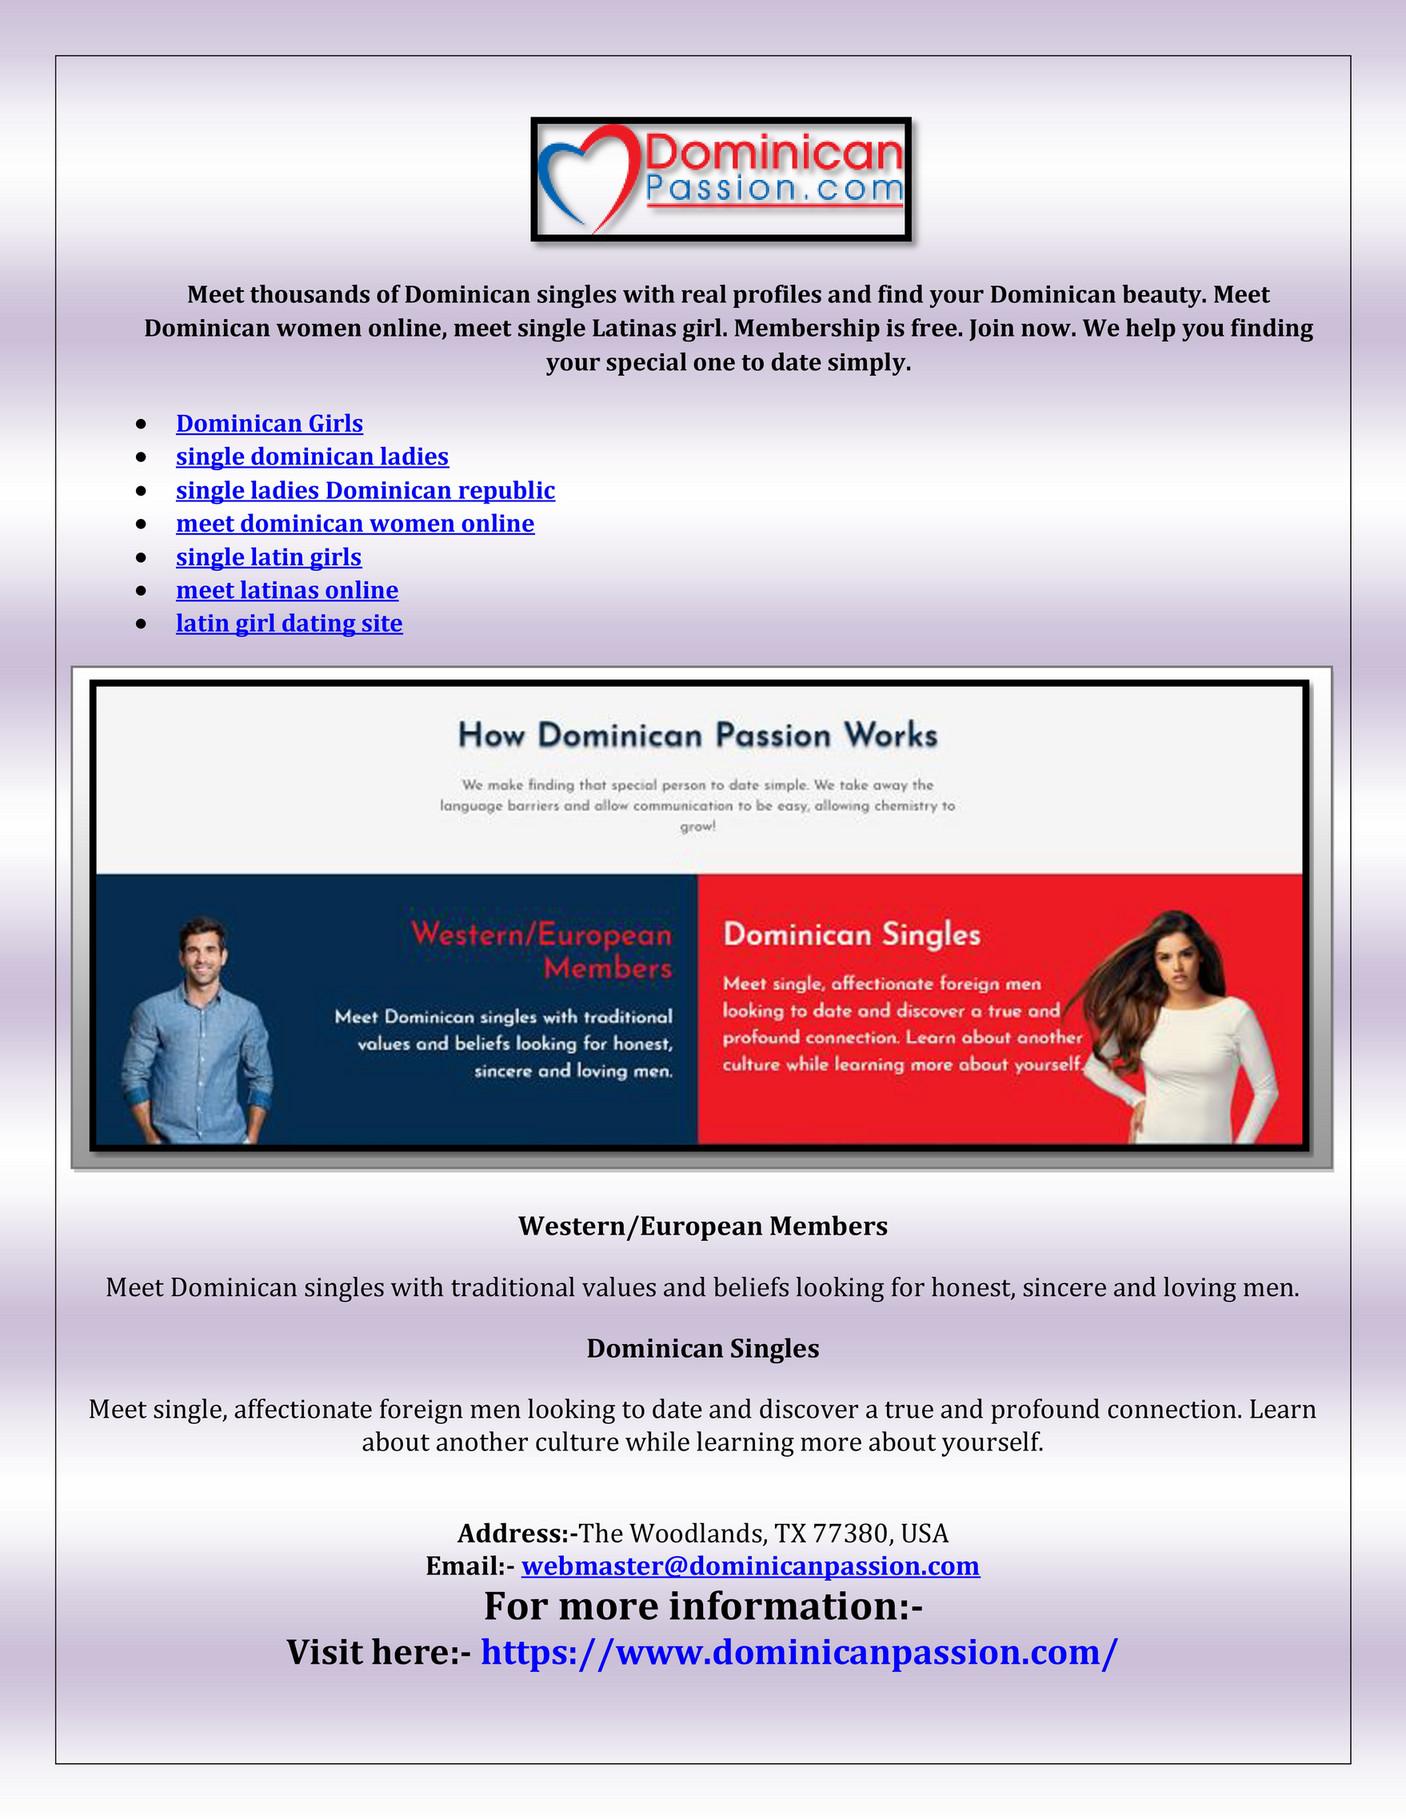 seo - meet single latinas - Page 1 - Created with Publitas com